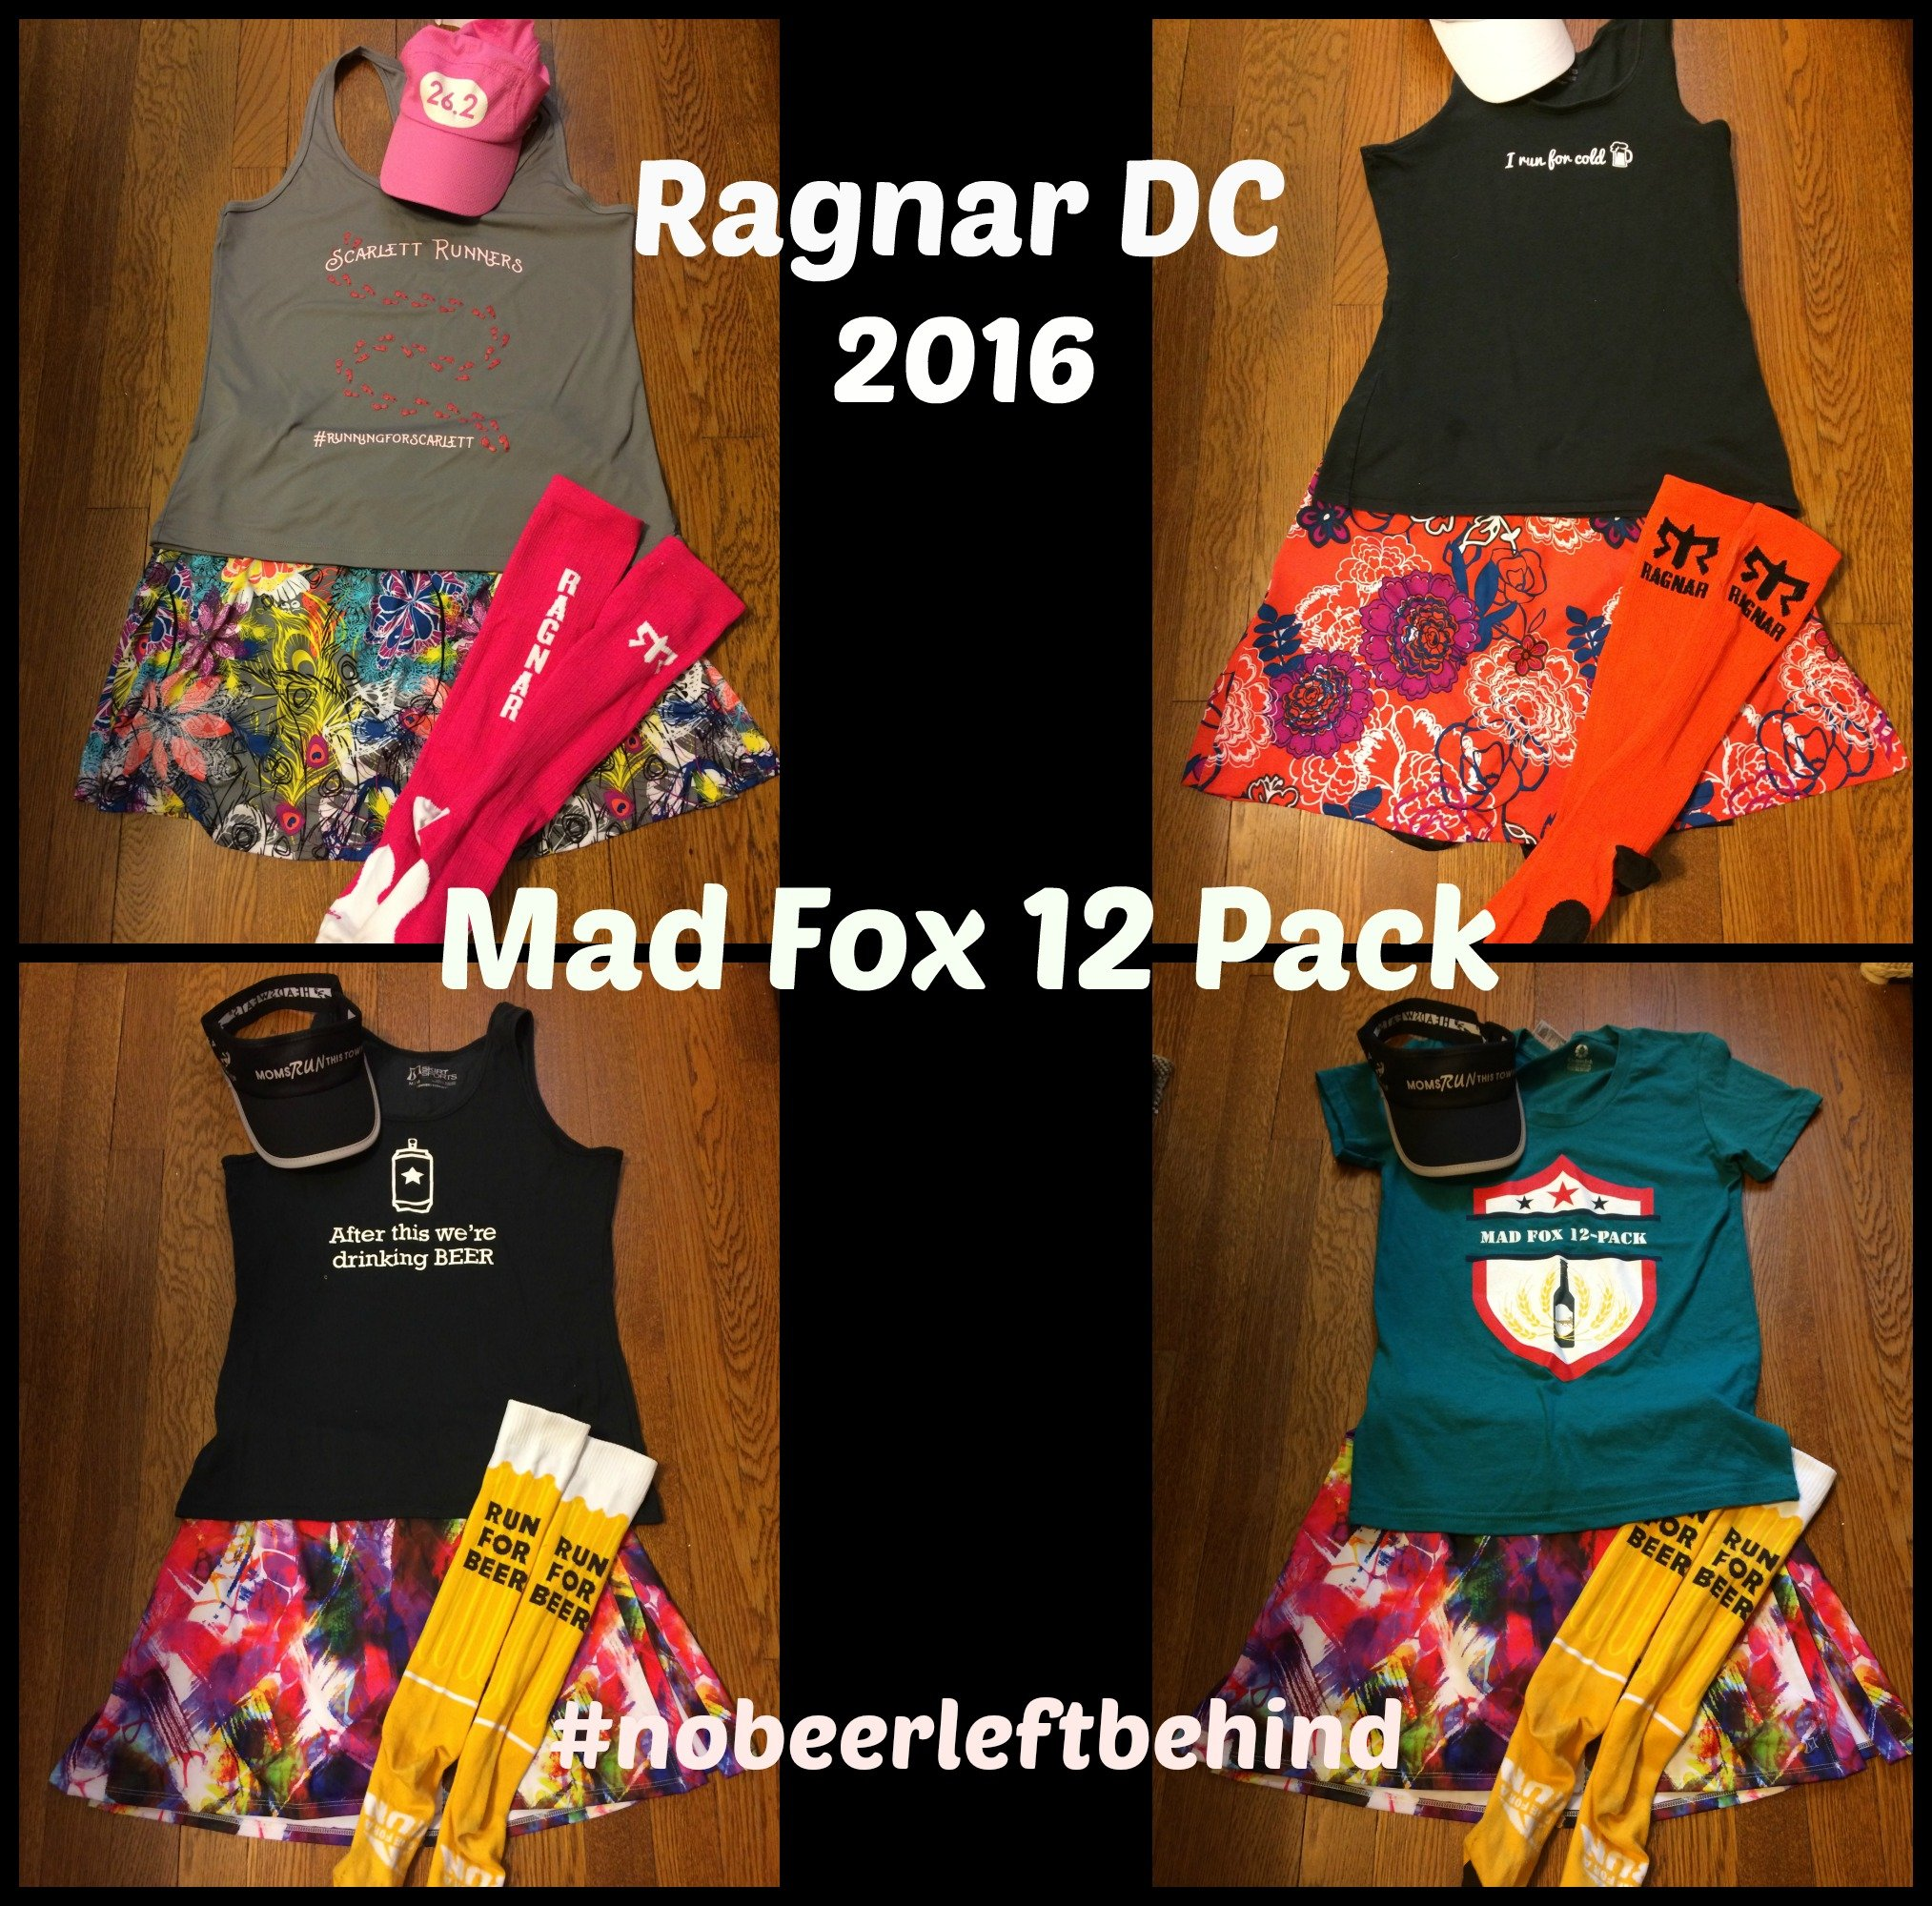 mad-fox-12-pack-ragnar-dc-2016